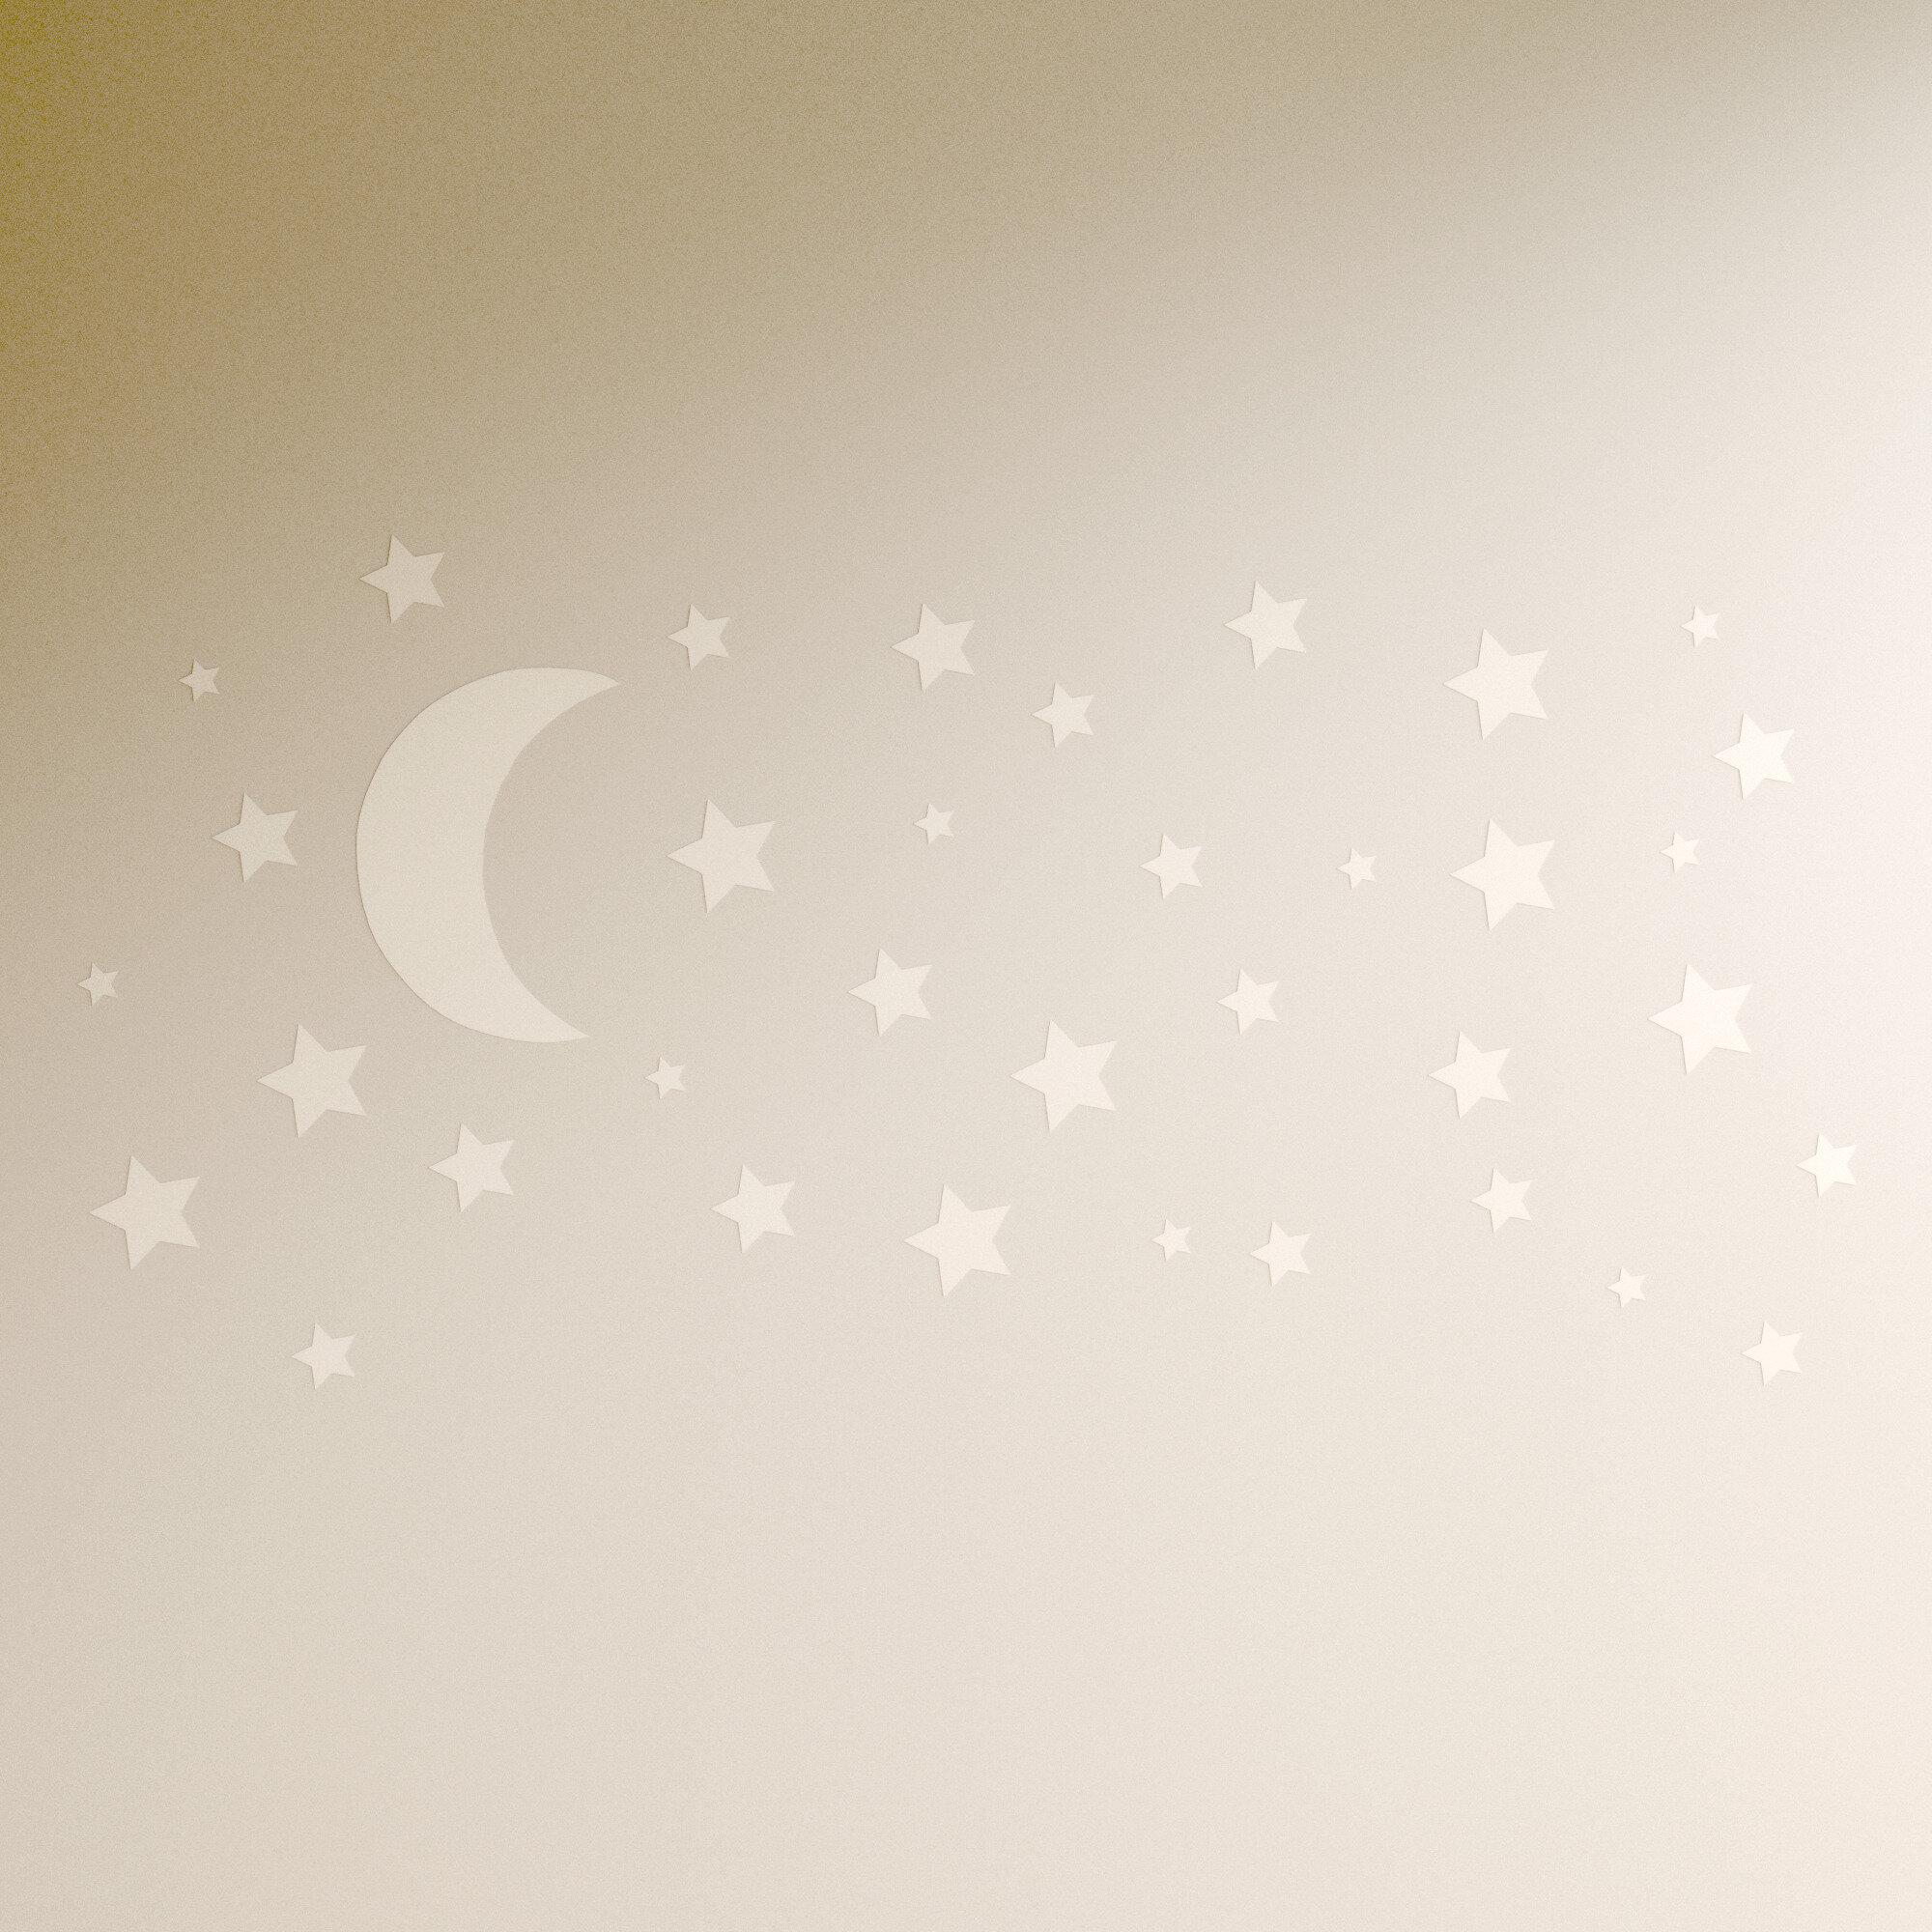 Wall tattoo moon with pattern stars bedroom